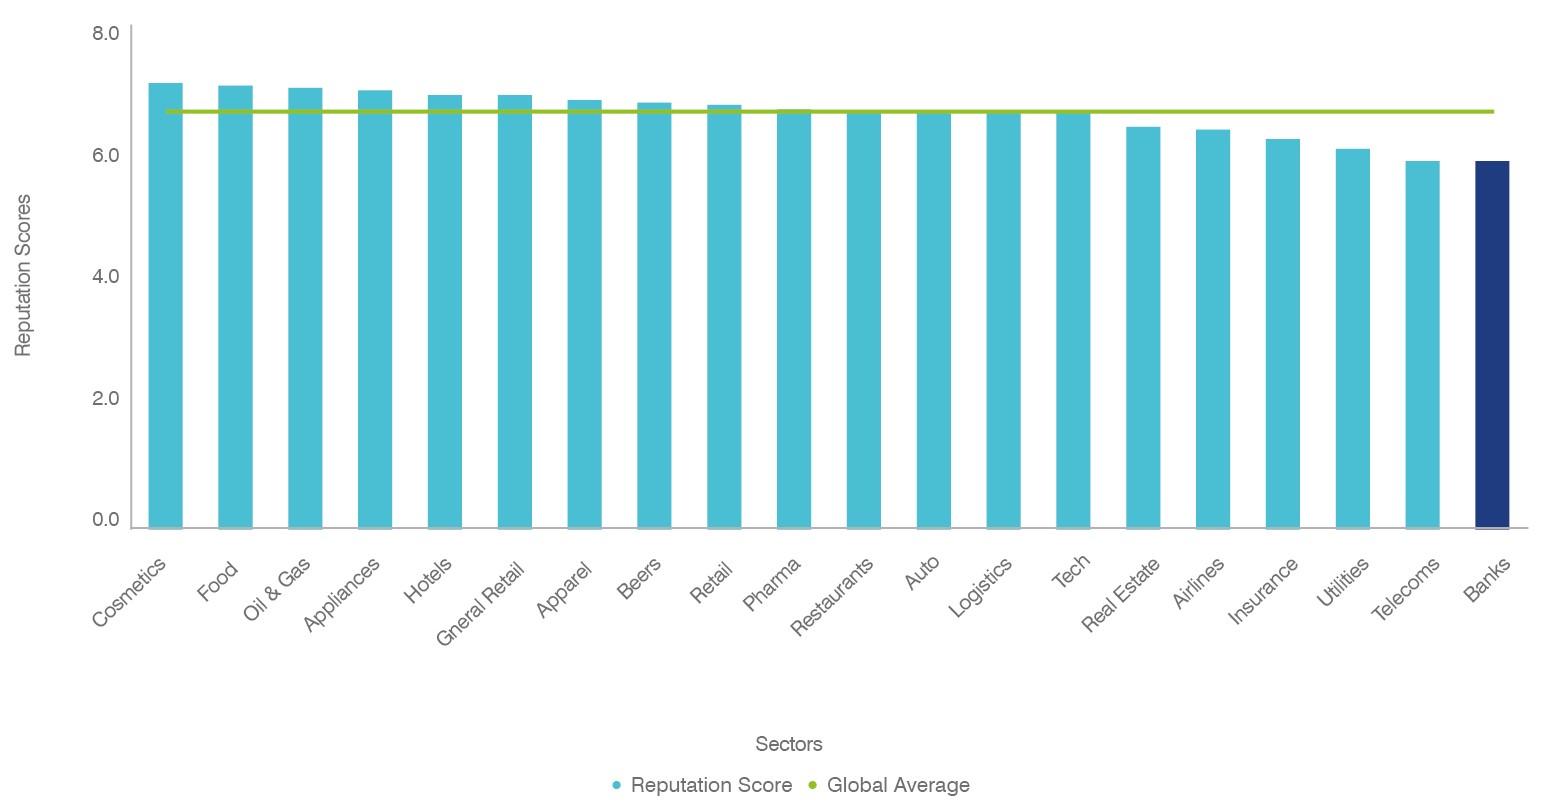 Global Sector Reputation Scores, Brand Finance Global Equity Monitor, 2020